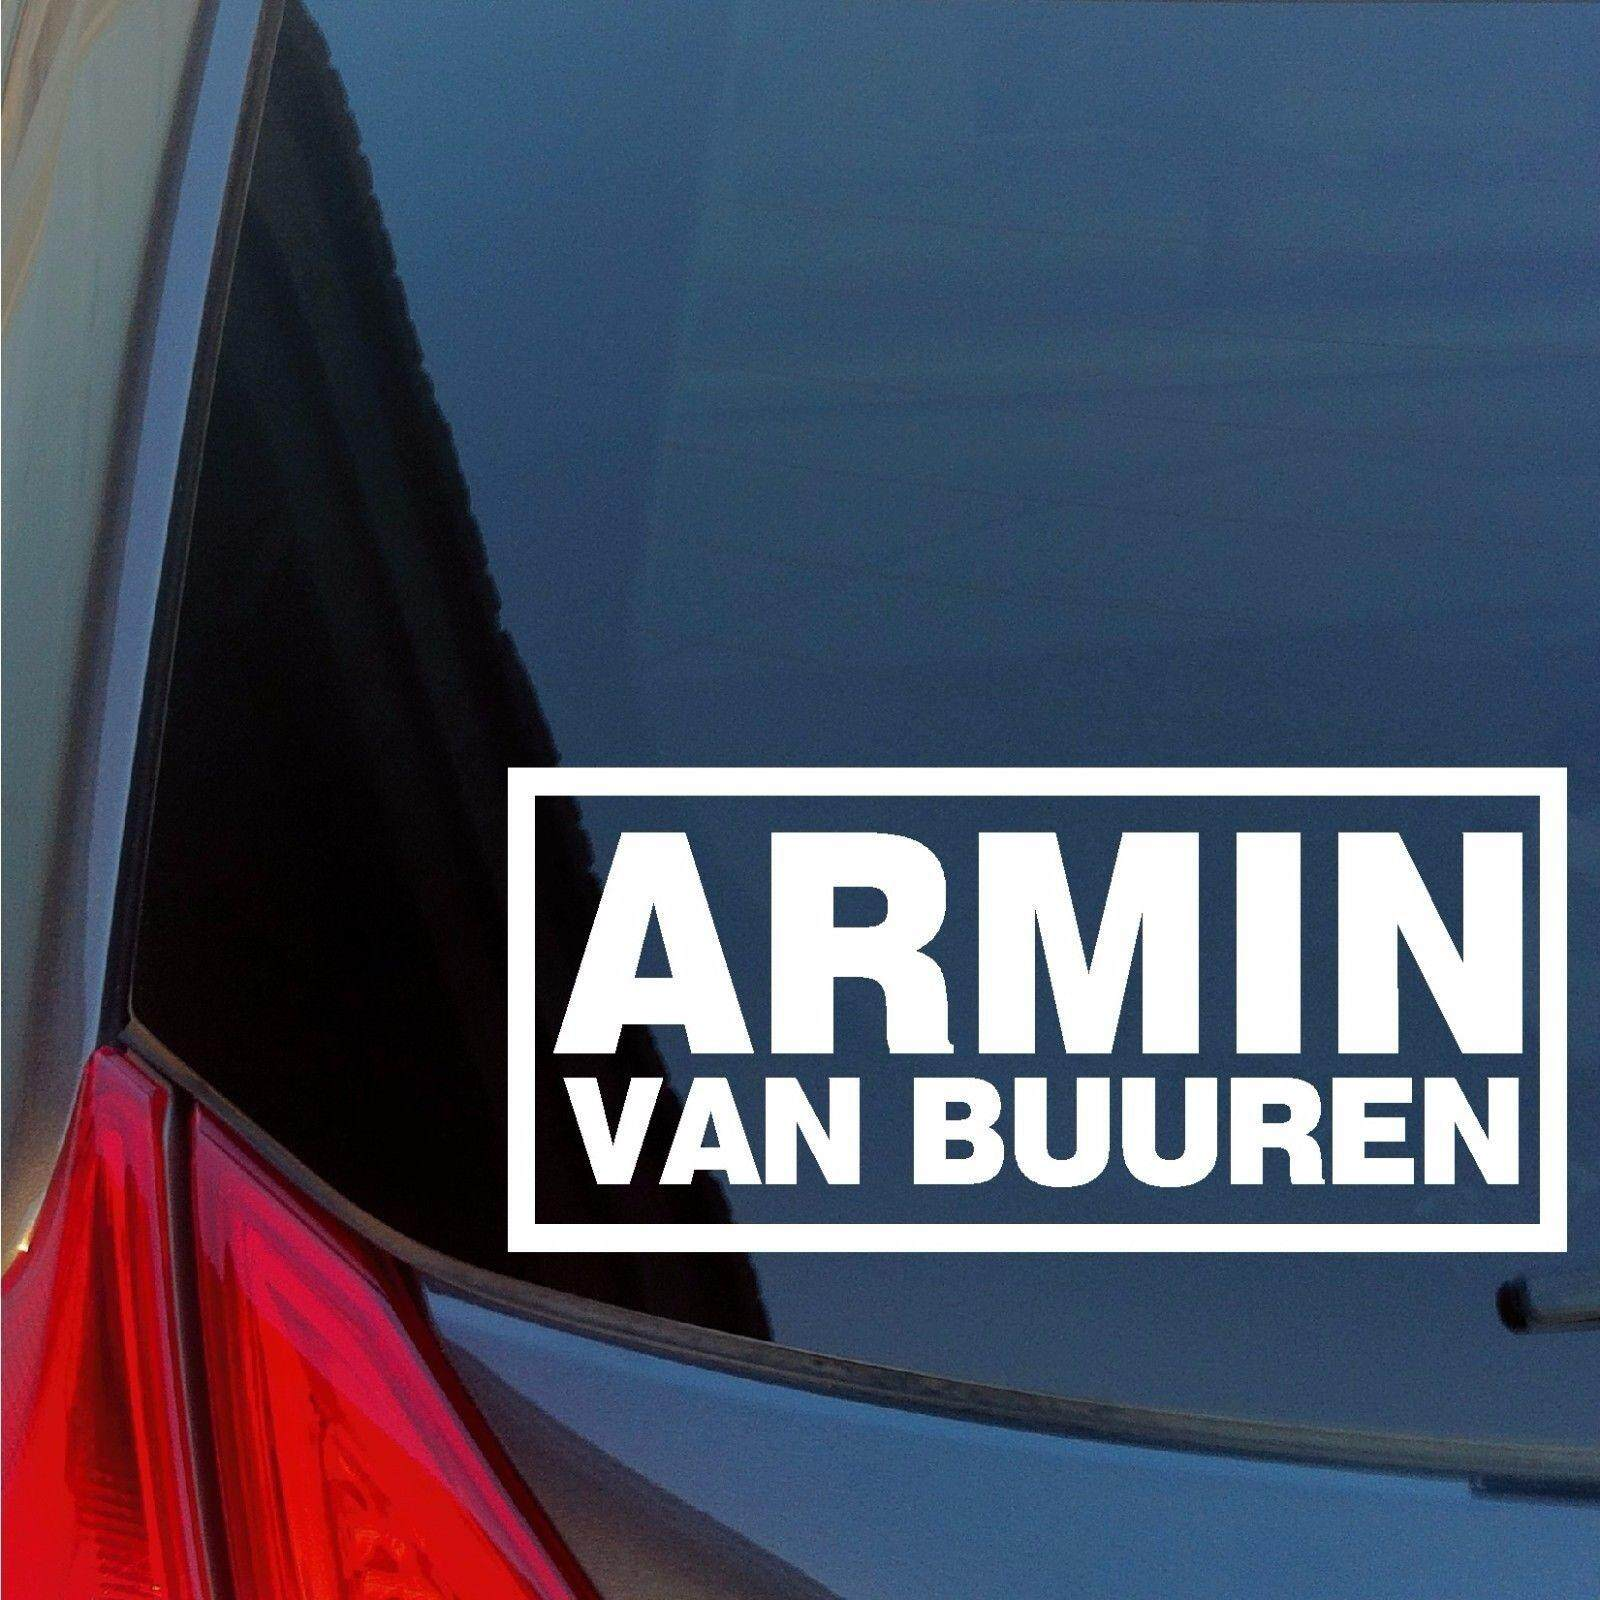 Armin Van Buuren vinyl sticker decal House Trance DJ night club house EDM  EDC -15cm